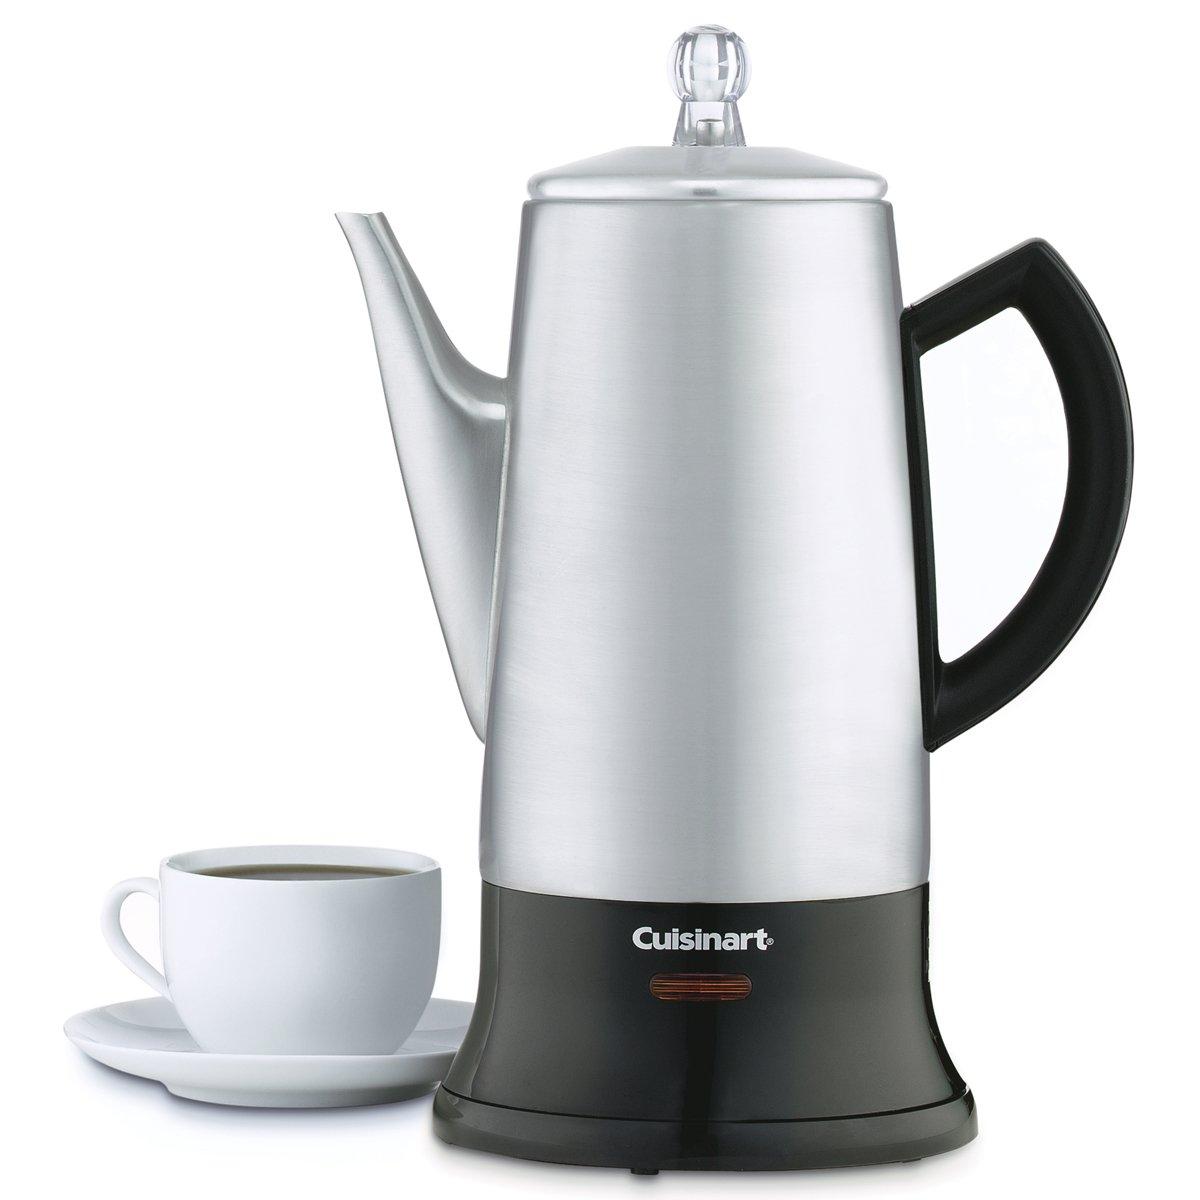 12 Cup Cordless Perculator Coffee Maker by Cuisinart